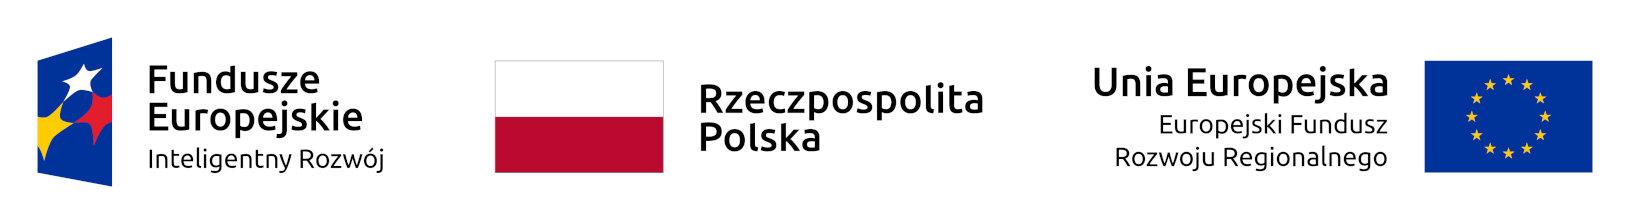 Logotypy UE, FE i Polskii